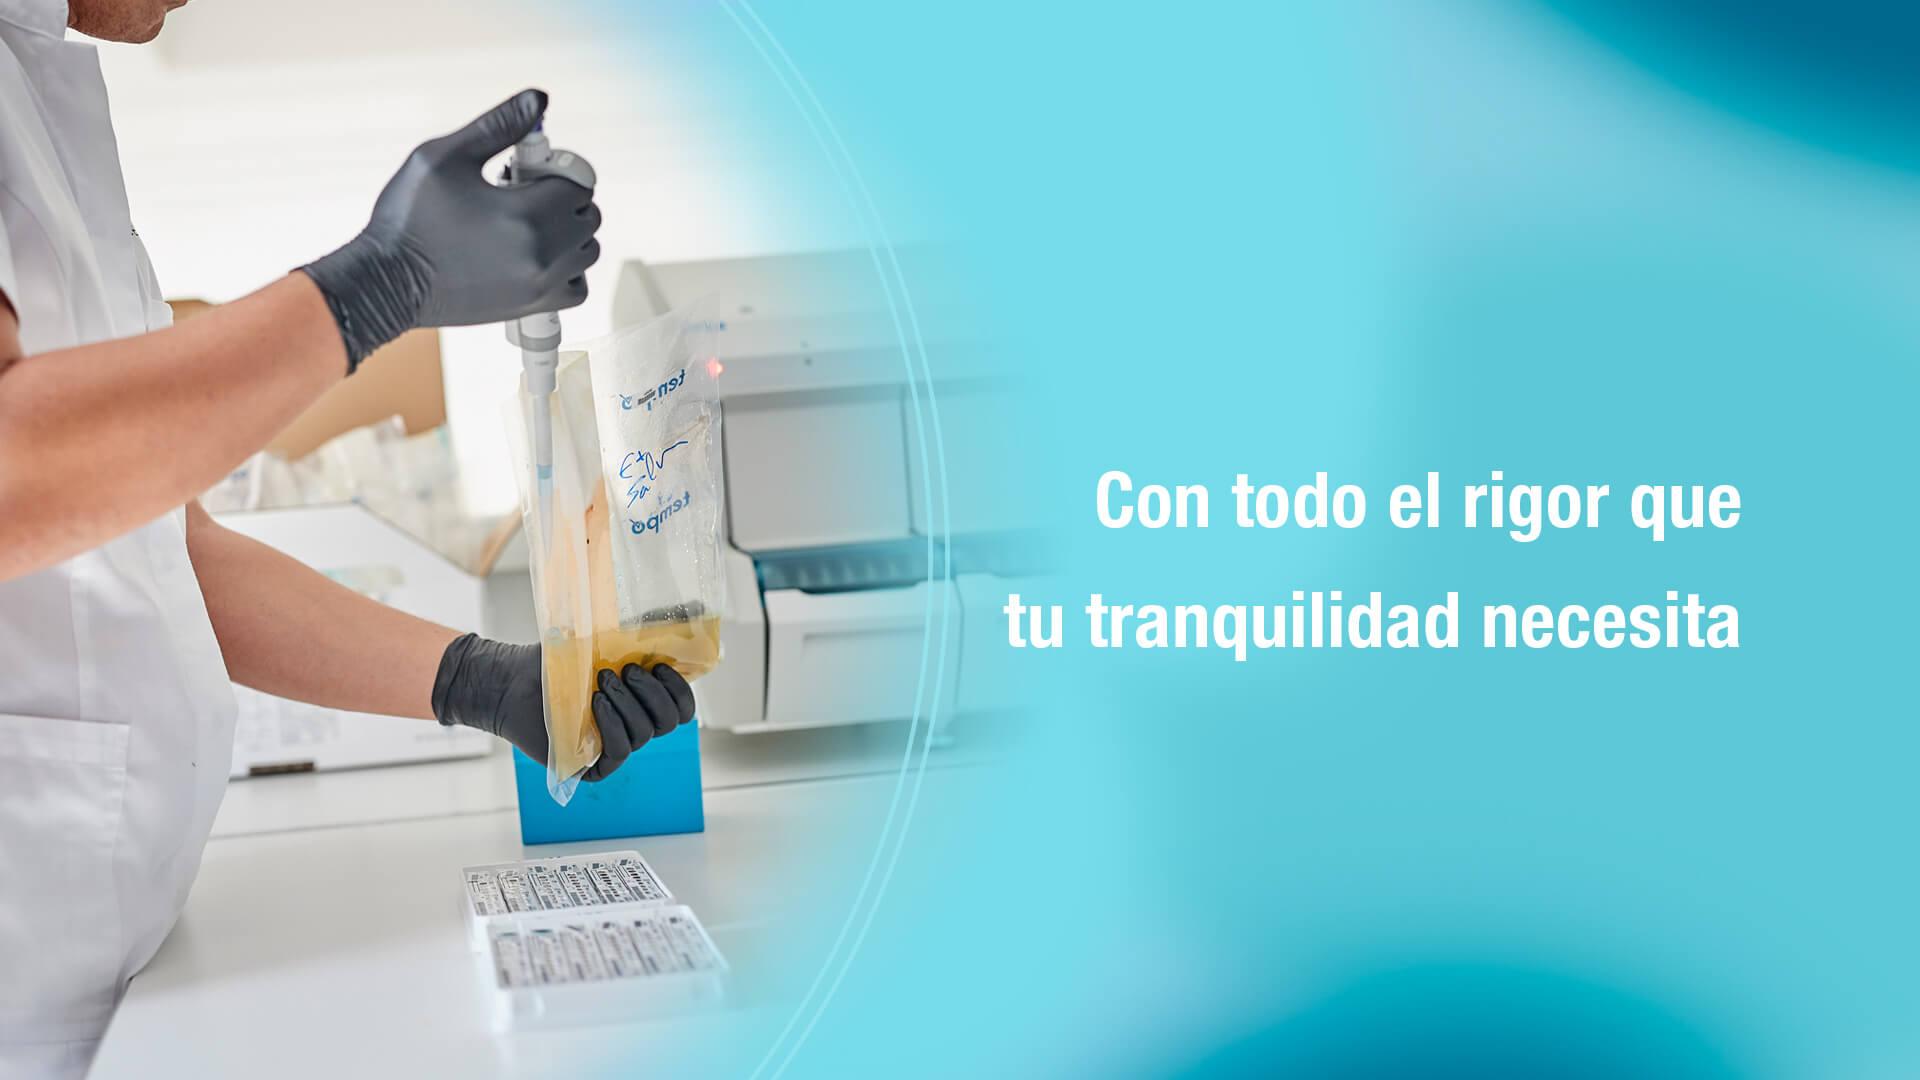 slider2-biolab-1920x1080_renzo